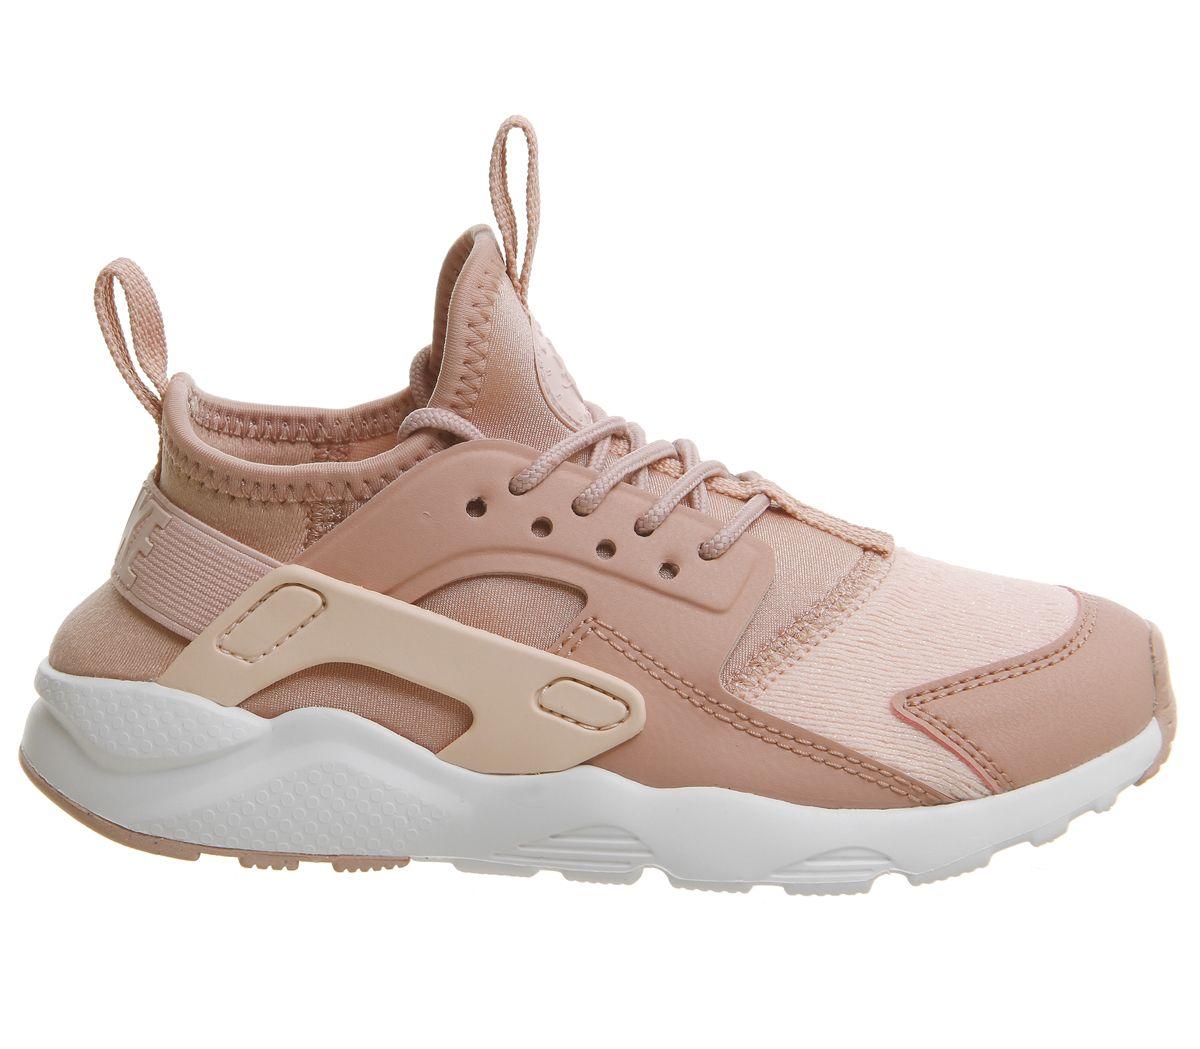 f5768fbcba372 Nike Huarache Run Ultra Ps Trainers Rust Pink Storm Pink - Unisex